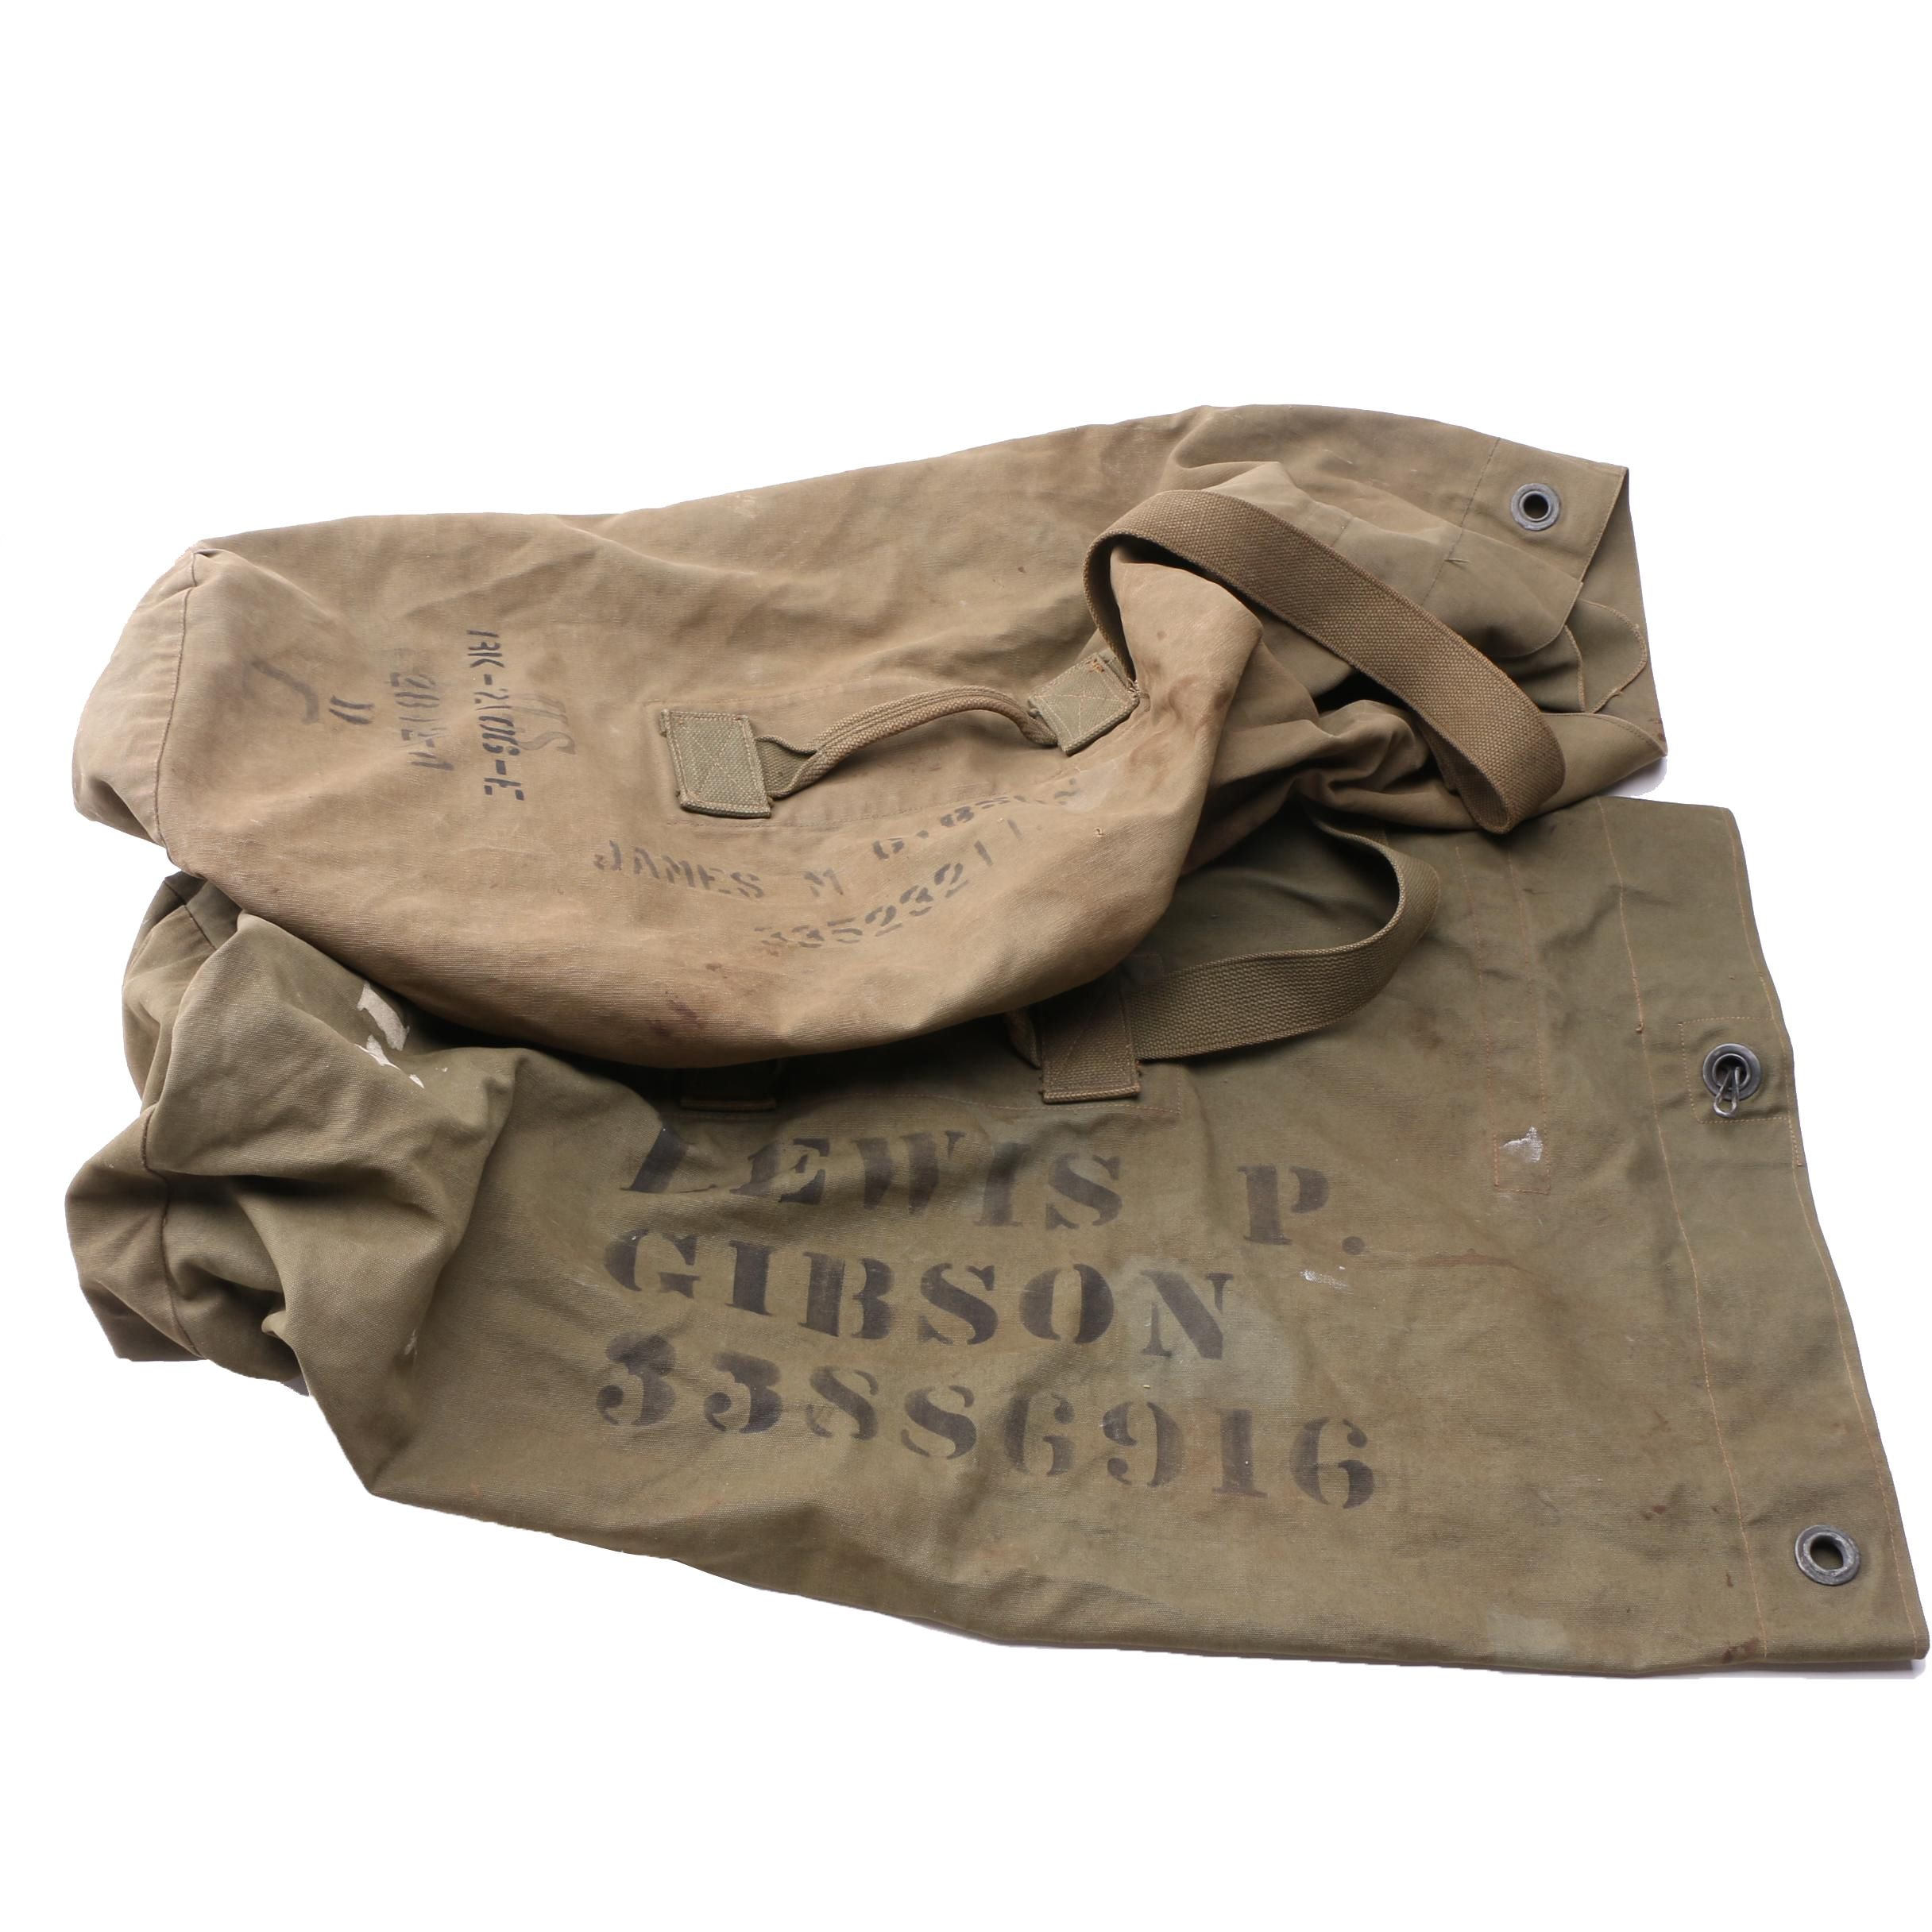 U.S. Military Duffel Bags